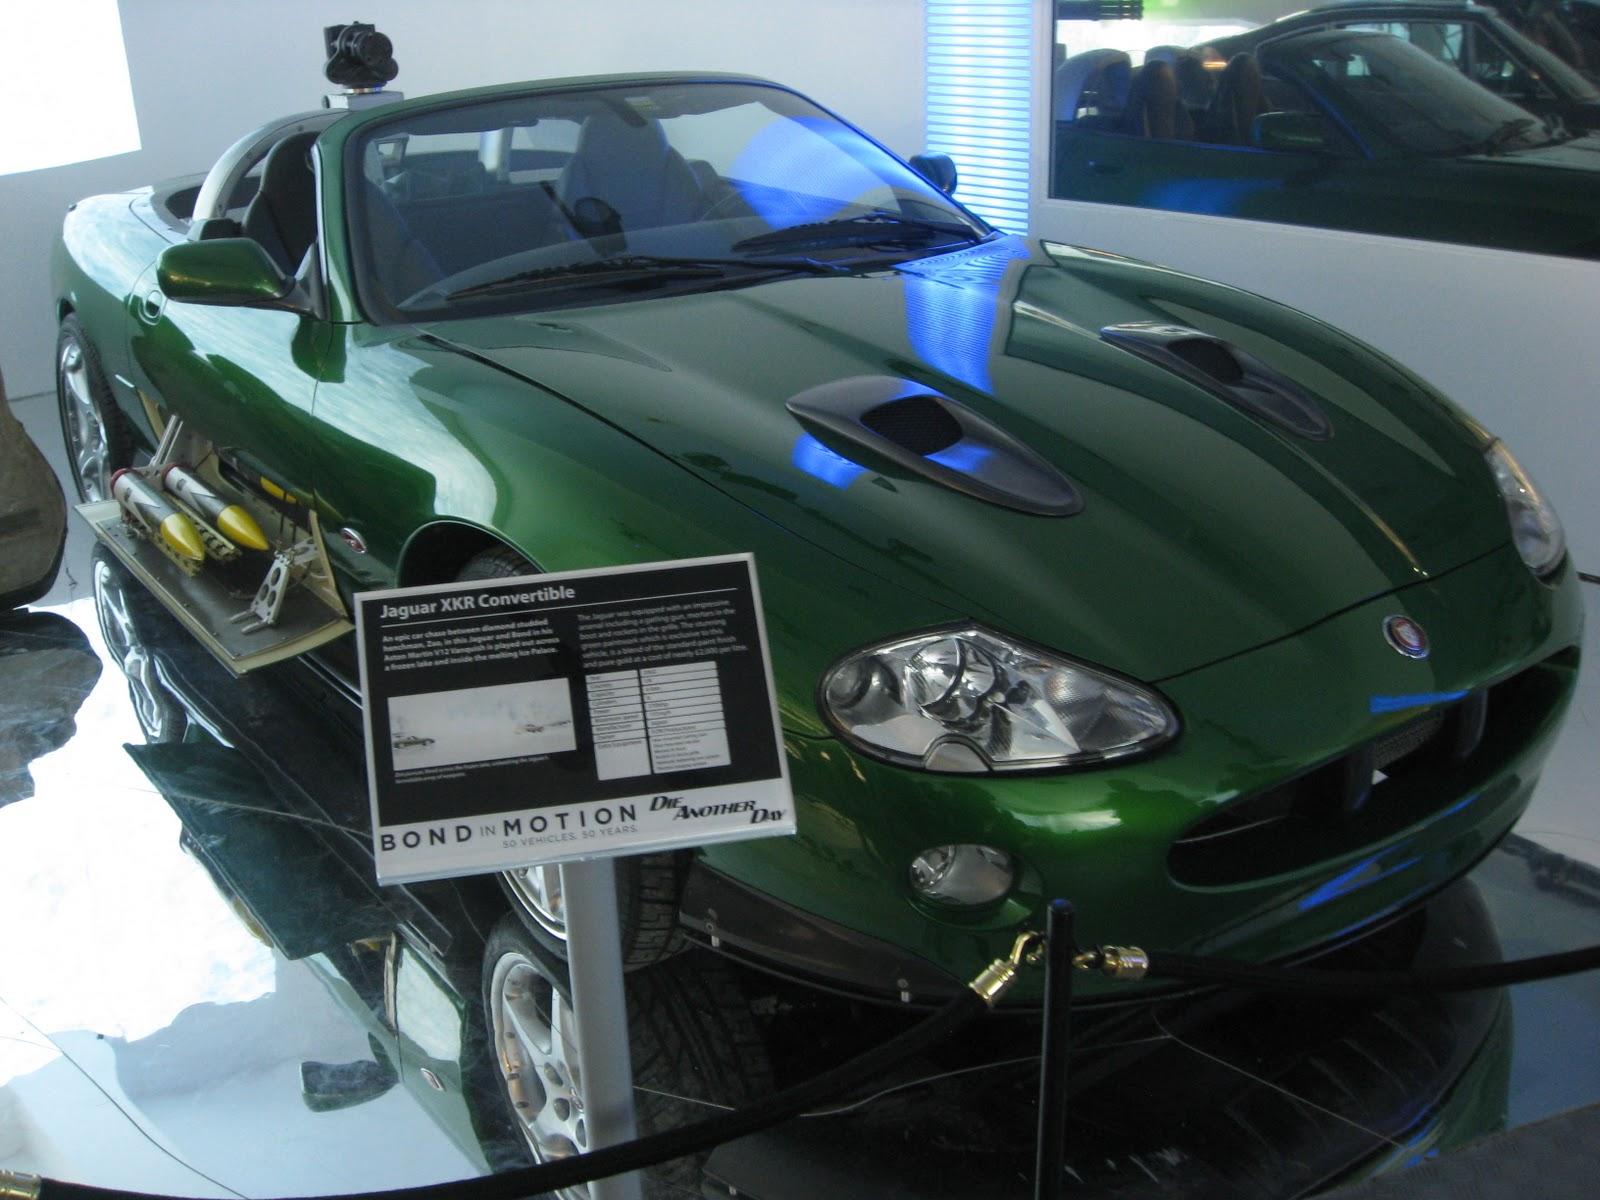 http://2.bp.blogspot.com/-heuzJDqOUEY/Tym5-ycPnnI/AAAAAAAAAUg/-xVzdHpuAz0/s1600/Jaguar+XKR.JPG